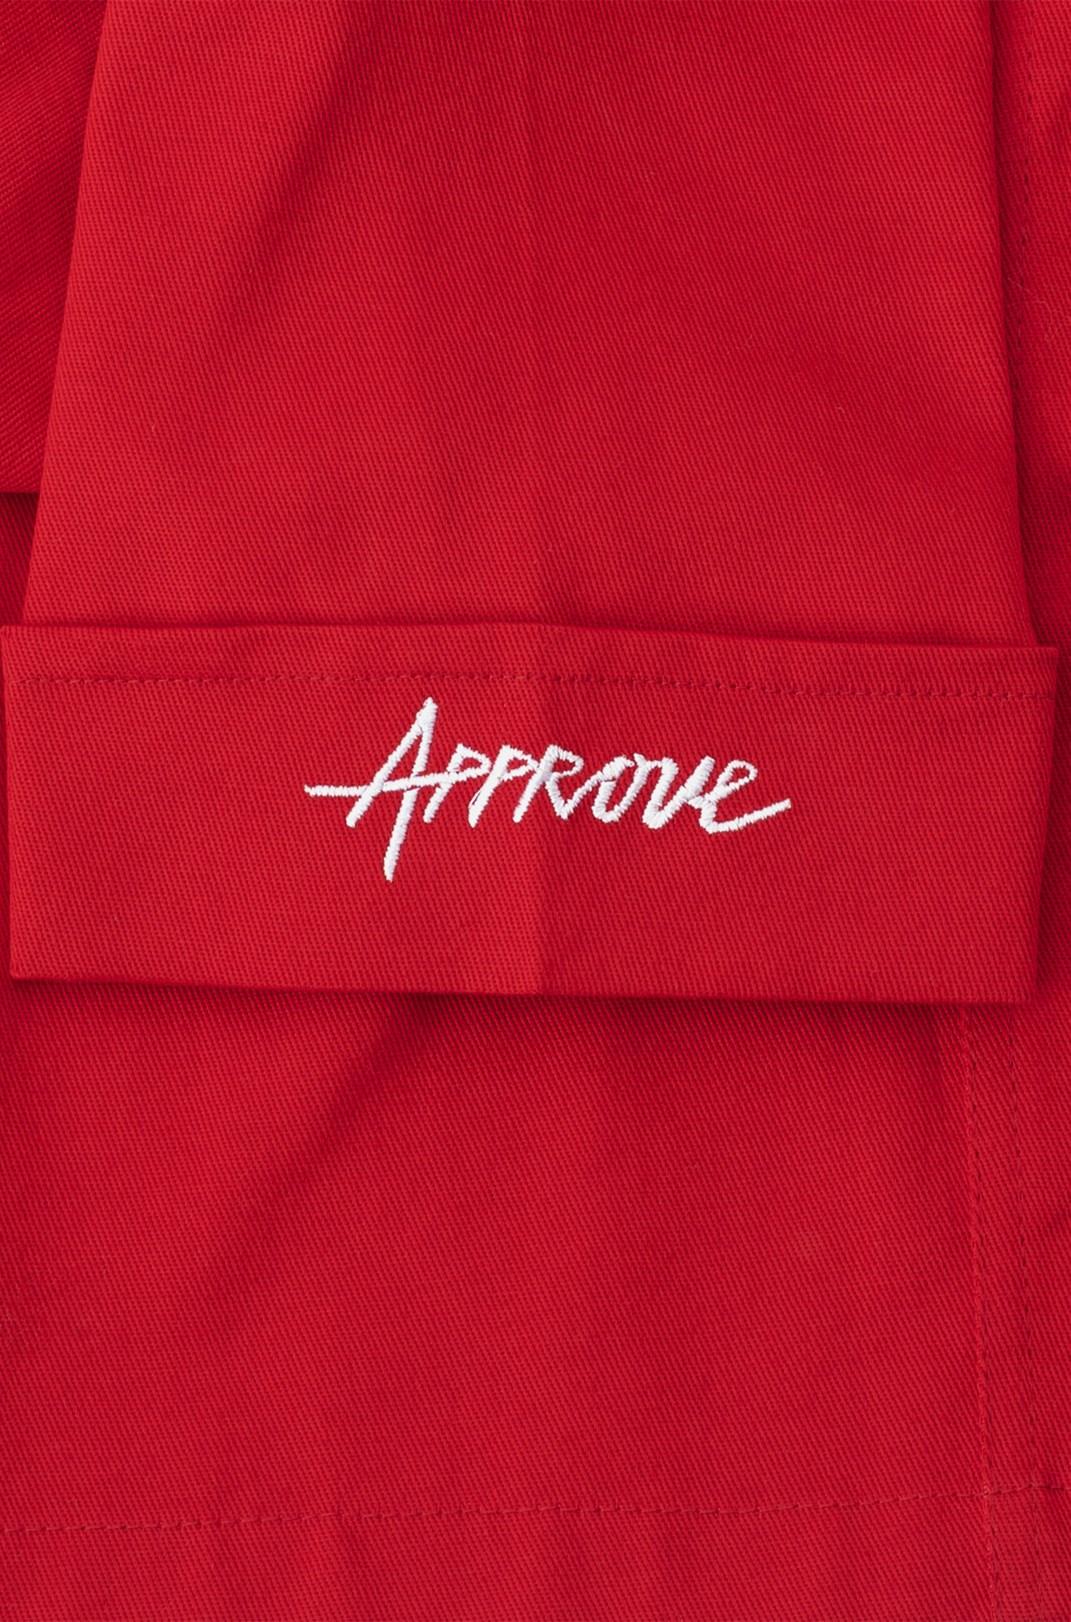 Camisa Sarja Approve Workwear Vermelha